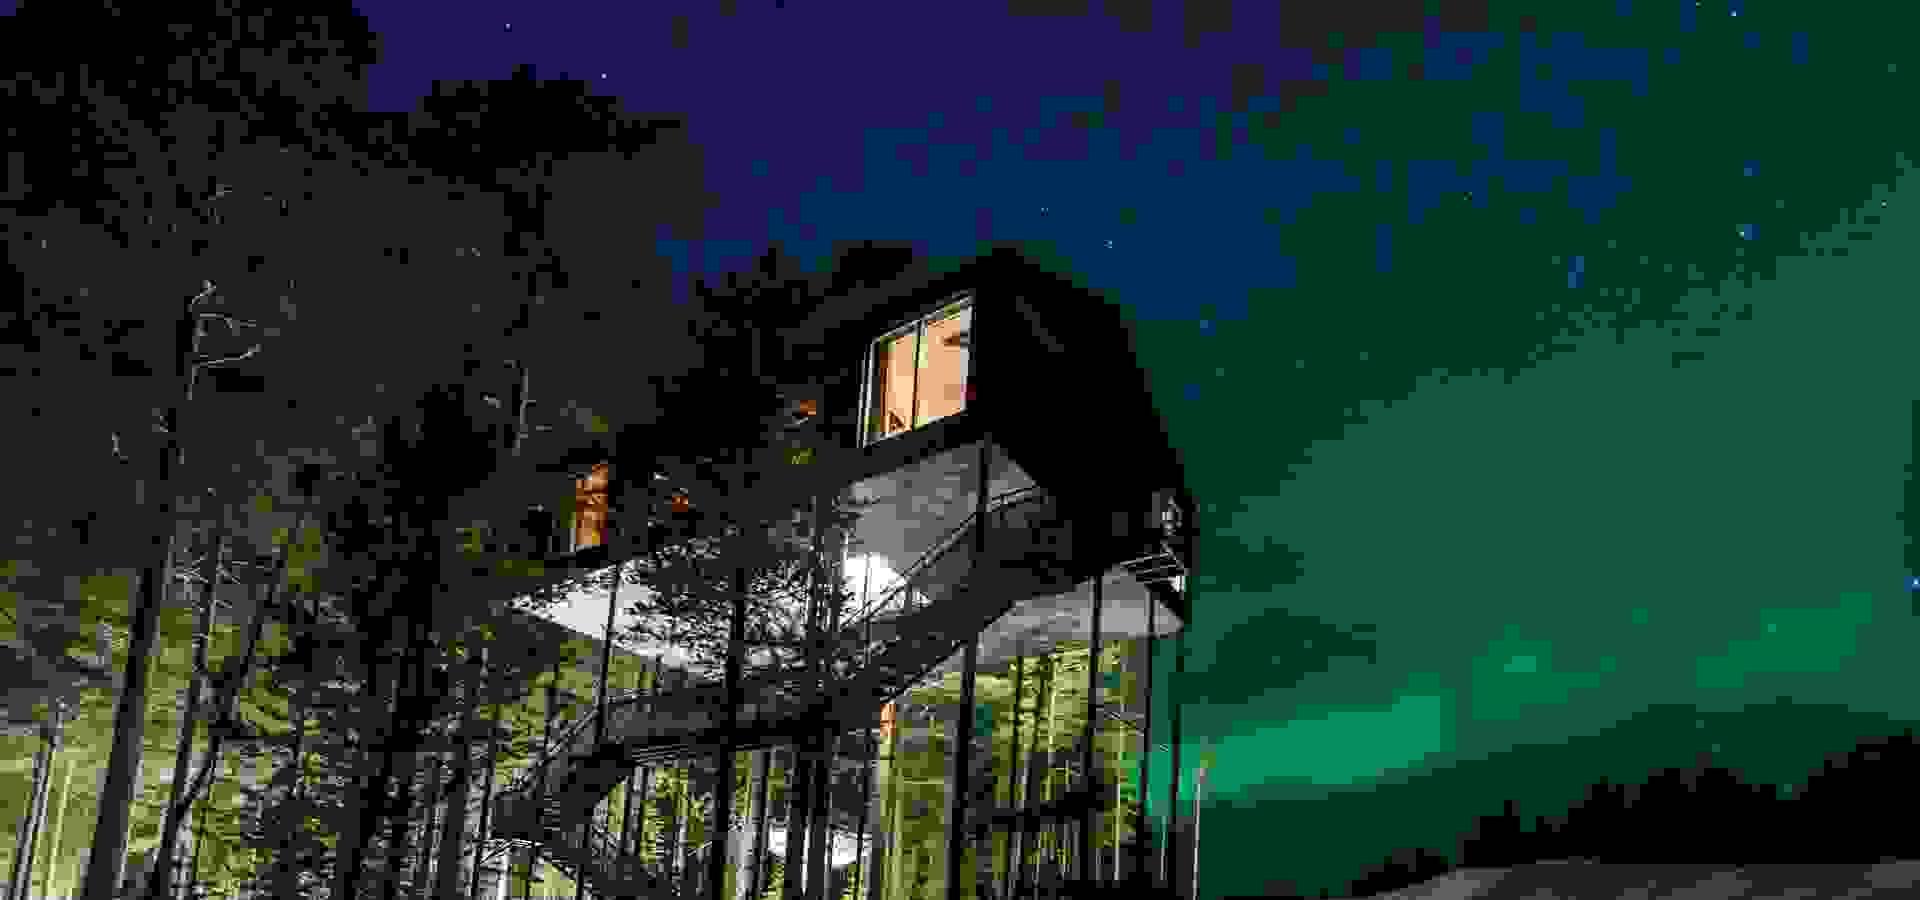 treehotel, norrsken, sjunde rummet, foto: pressbild treehotel, 1920 x 900